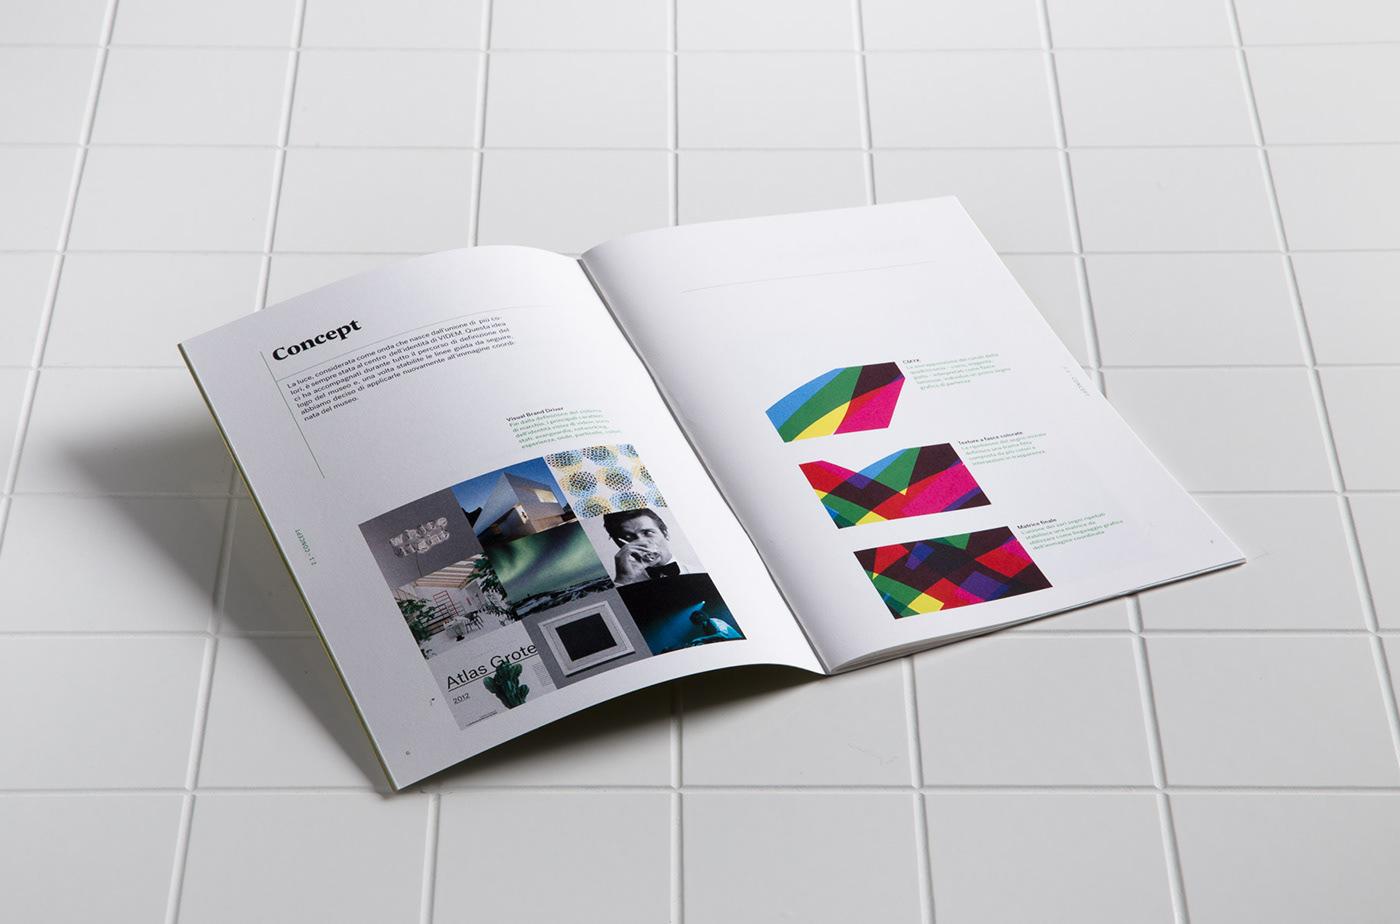 brand manual book visual identity colors tiles graphic design museum